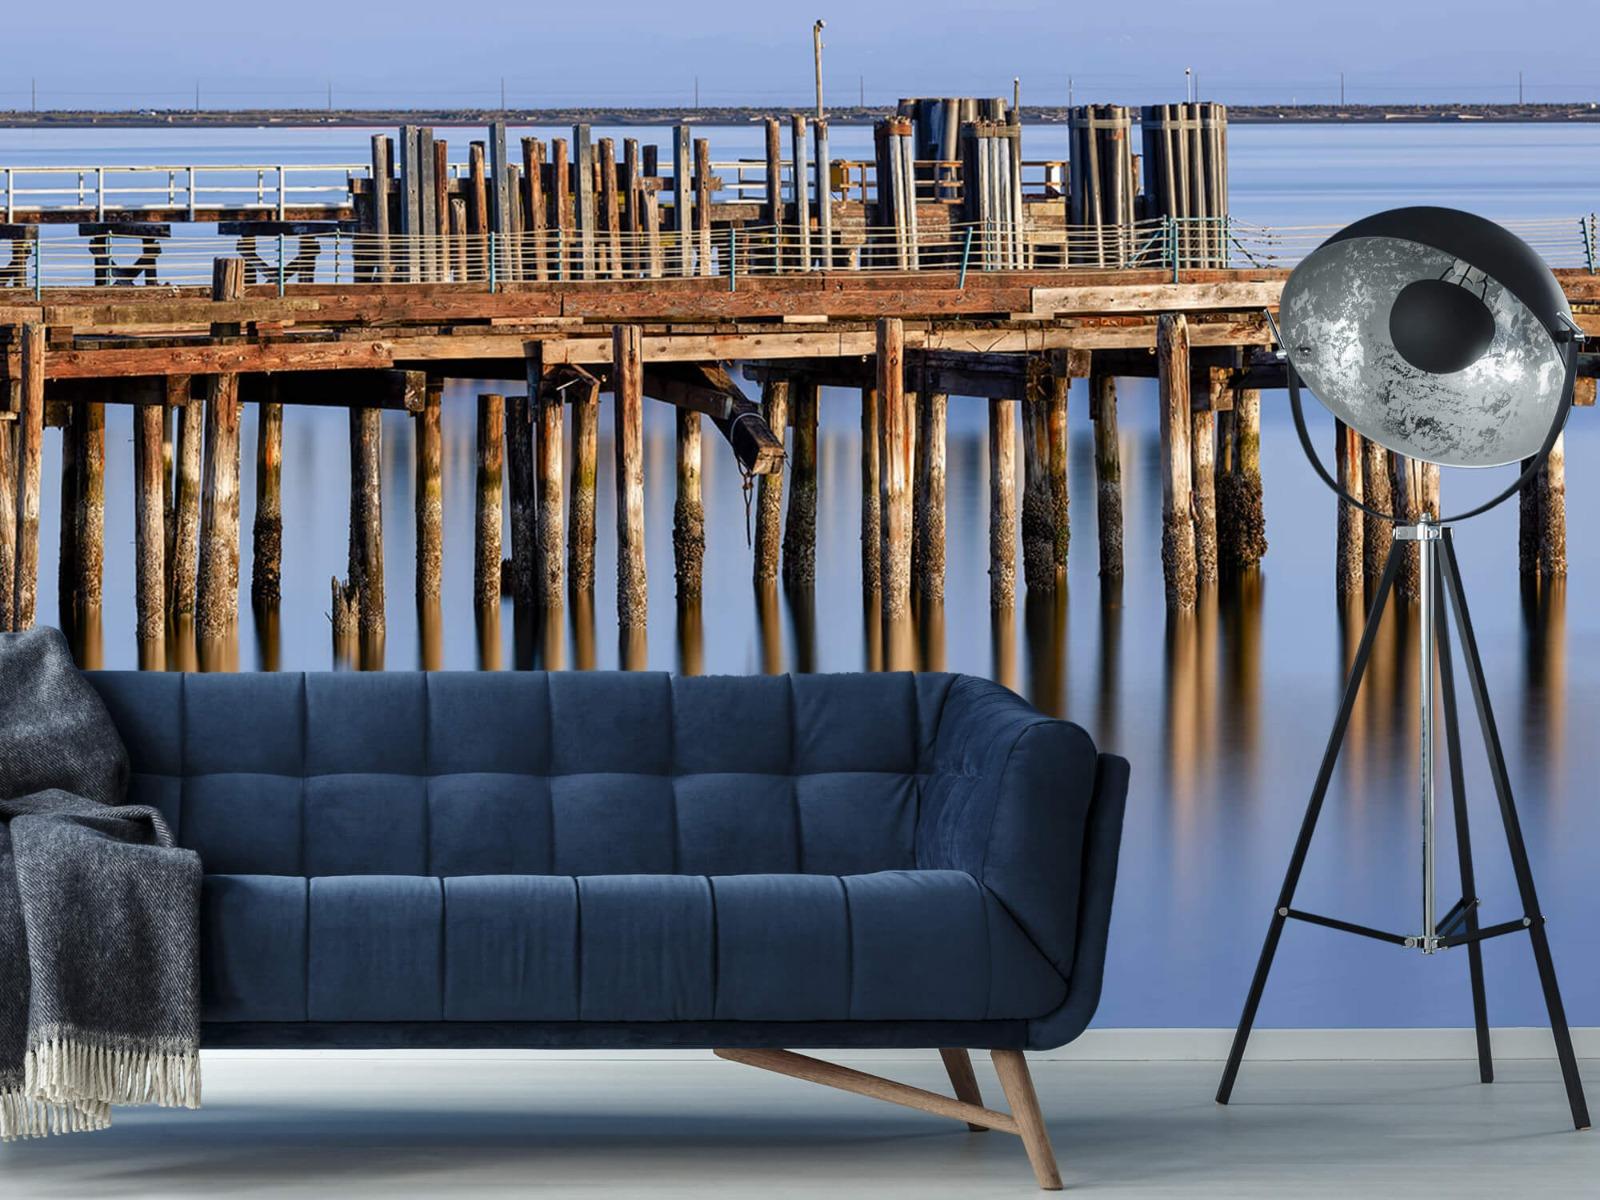 Houten Steigers - Steiger op houten palen - Wallexclusive - Slaapkamer 11